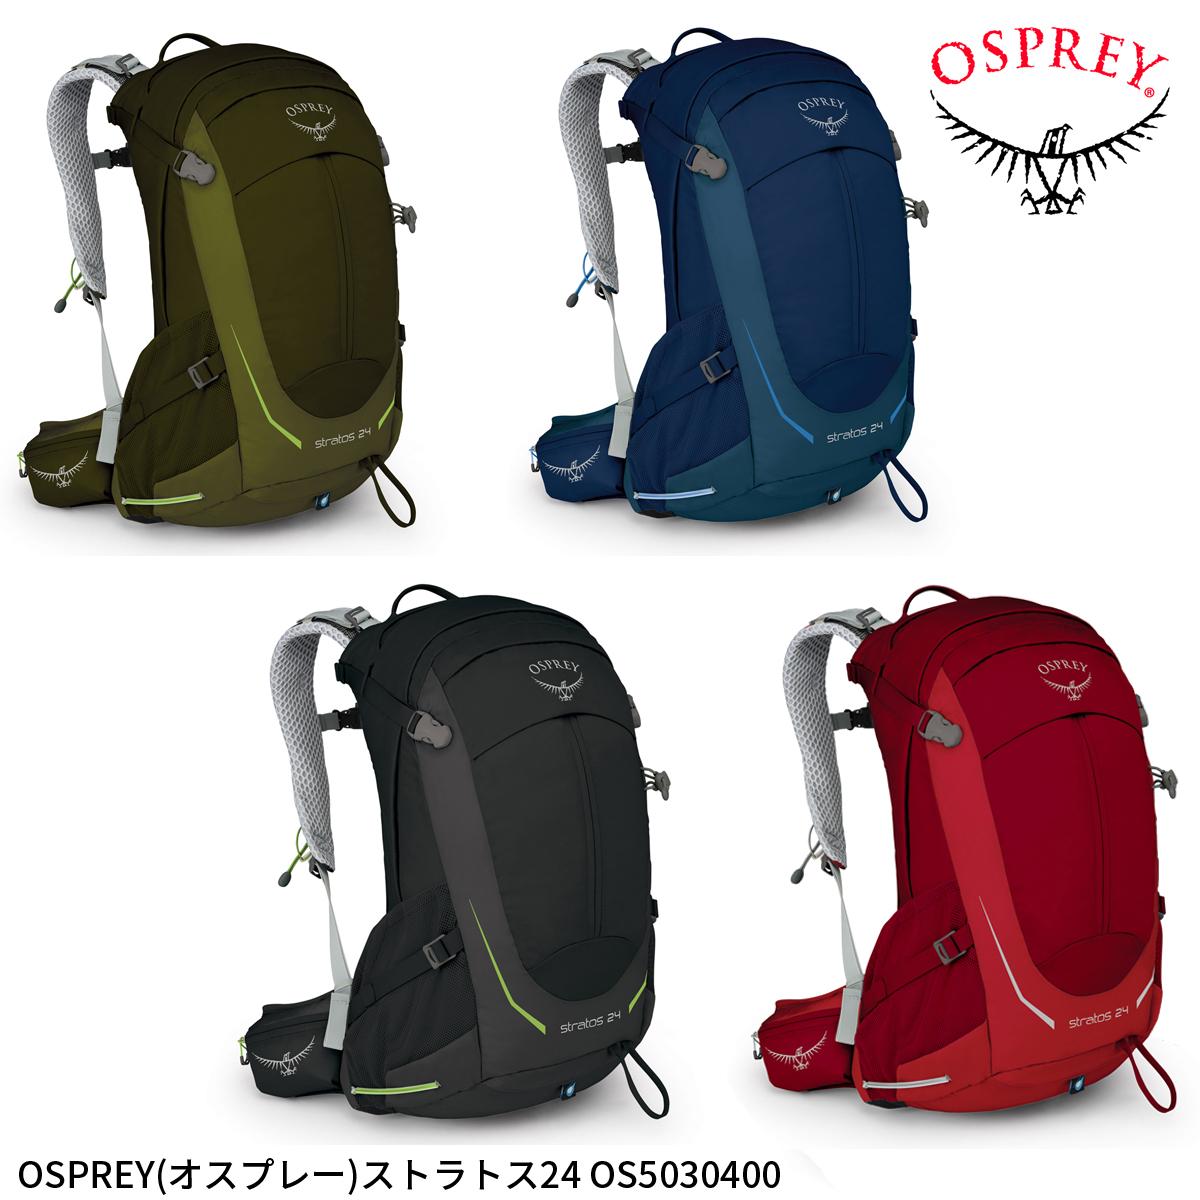 OSPREY(オスプレー)ストラトス24 OS5030400